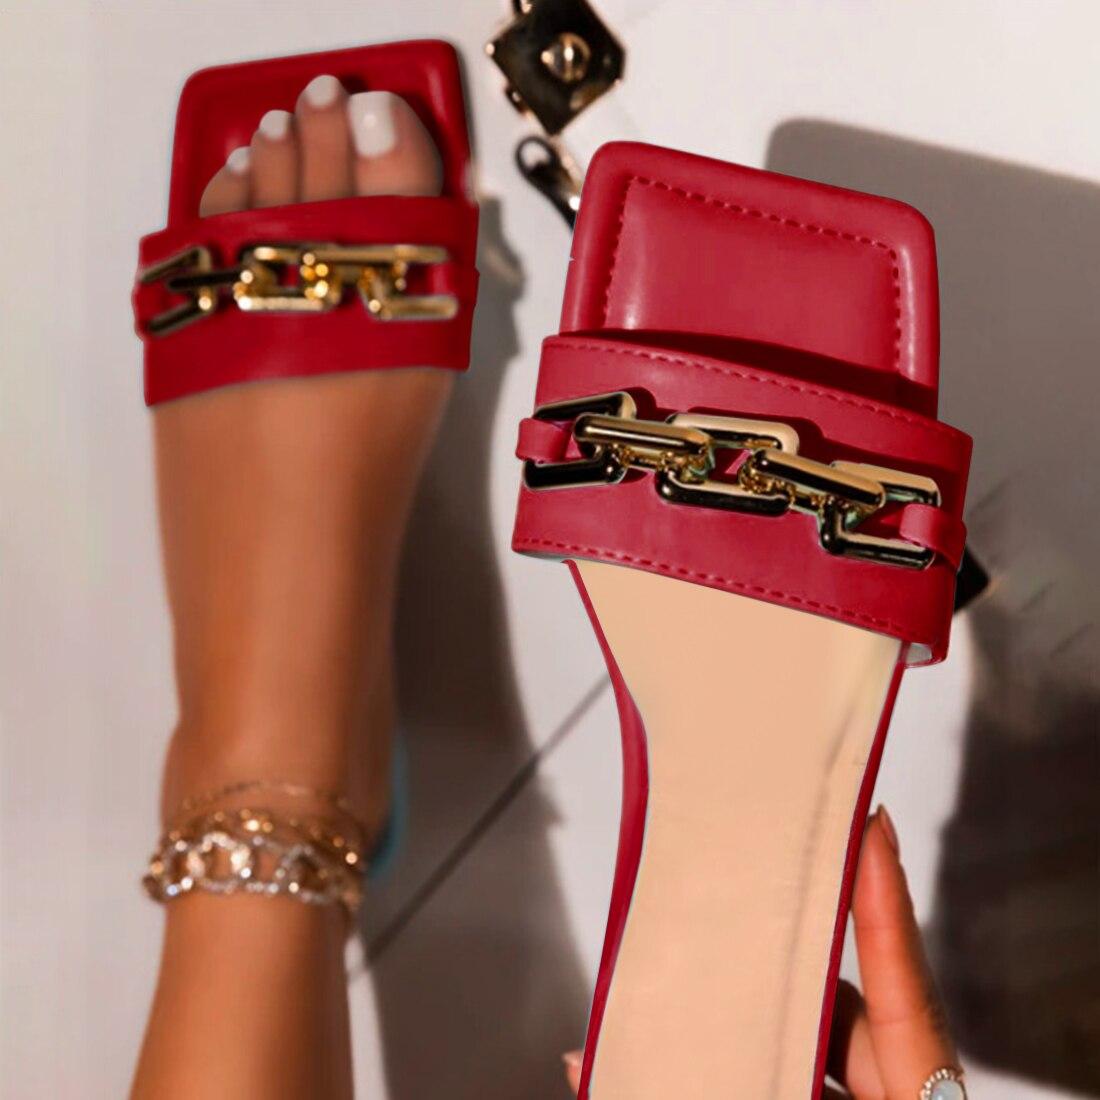 Women Slipper Sandals New Design Gold Chain Closed Toe Slip On Mules Shoes Flat Heels Square Head Casual Slides Flip Flop 2021